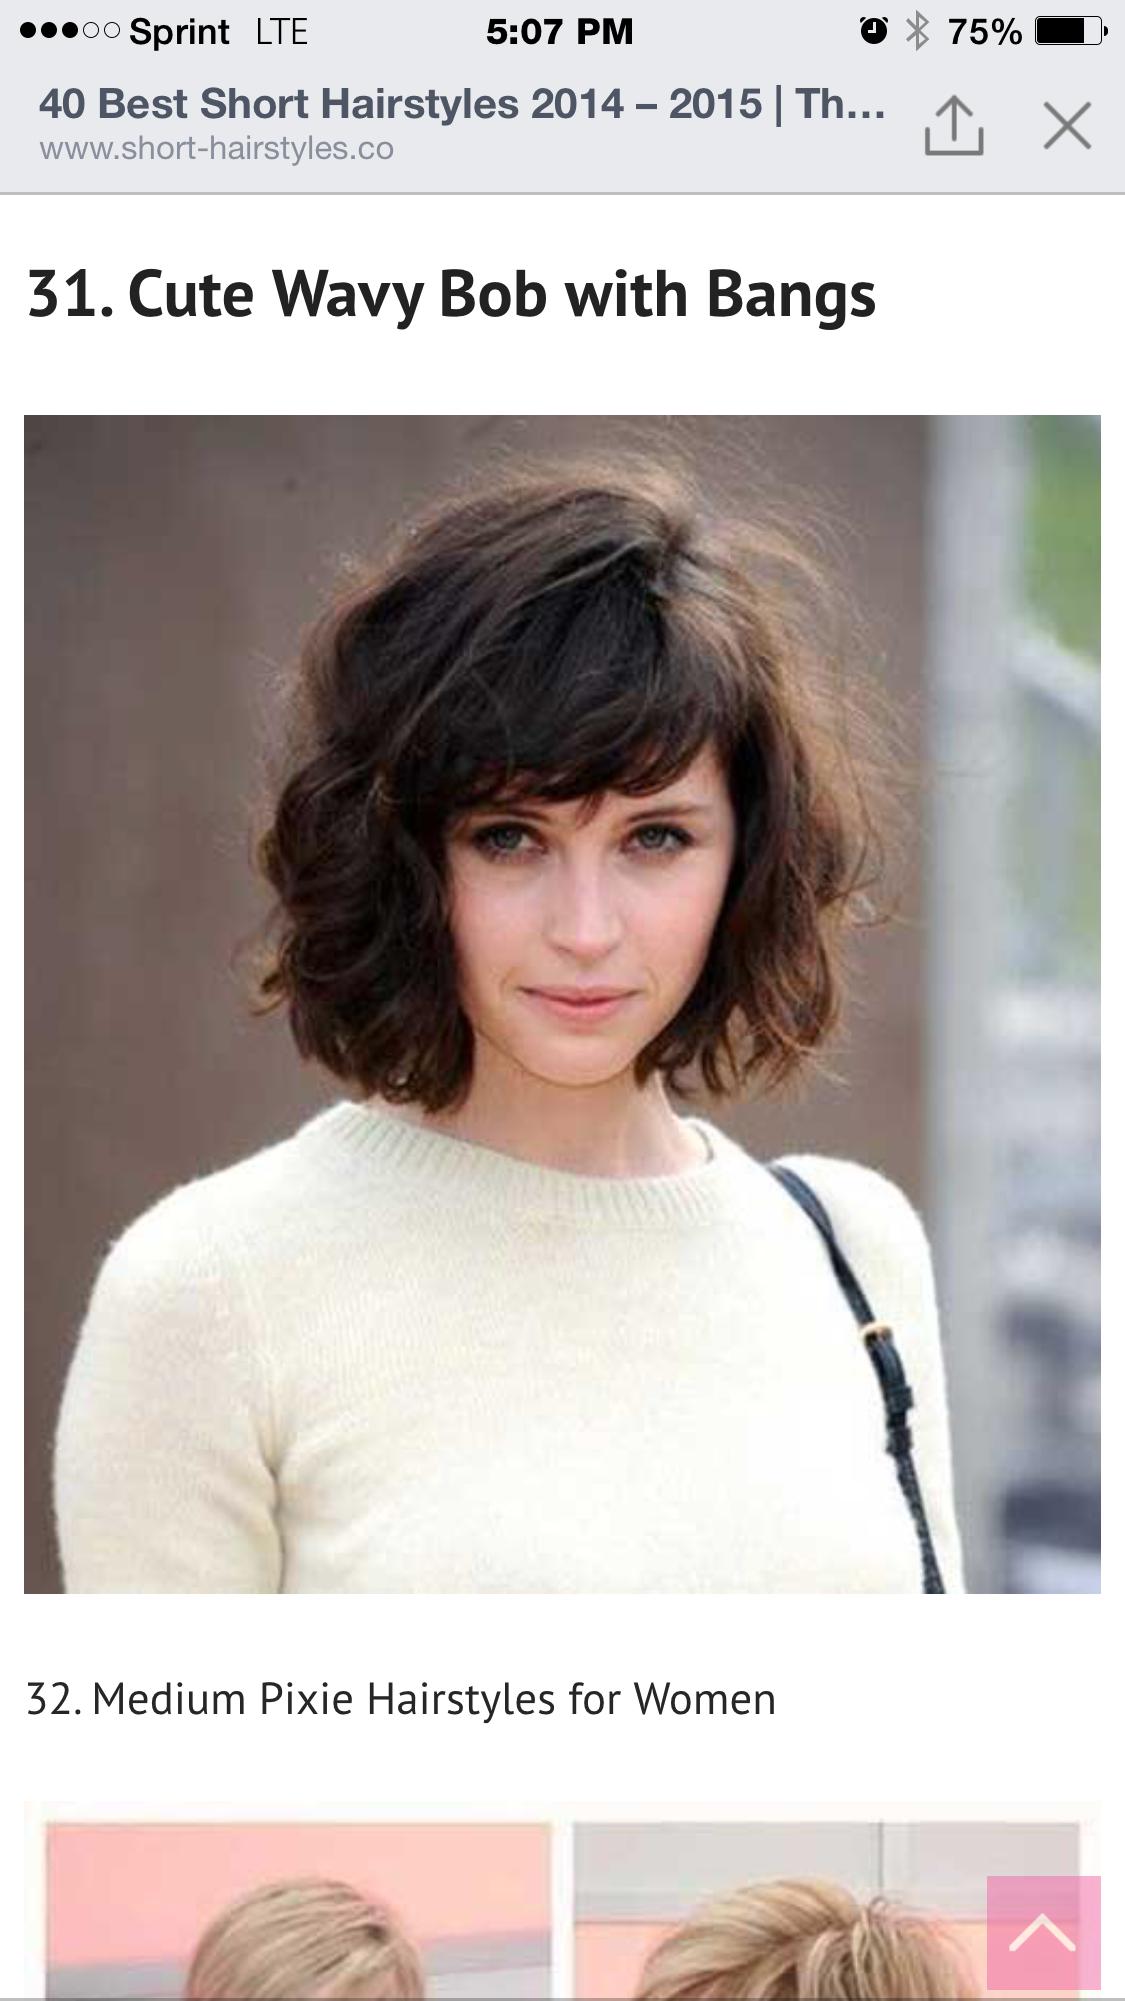 Pin by lindsey murawski on hair pinterest hair style short hair